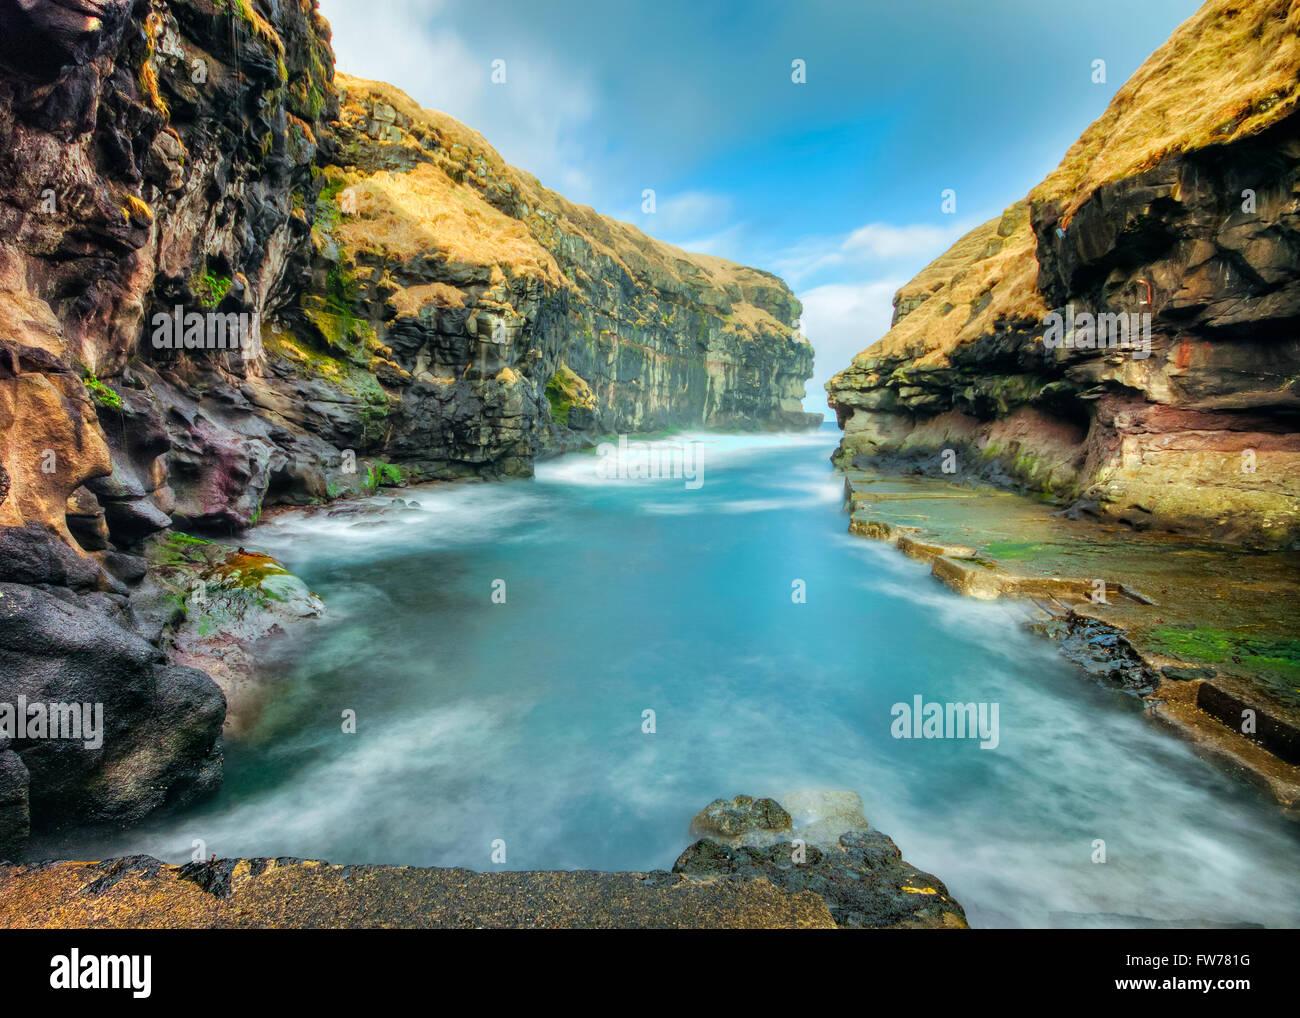 Winter Time at Gjogv, Faroe islands, Denmark Europe. Long Exposure - Stock Image